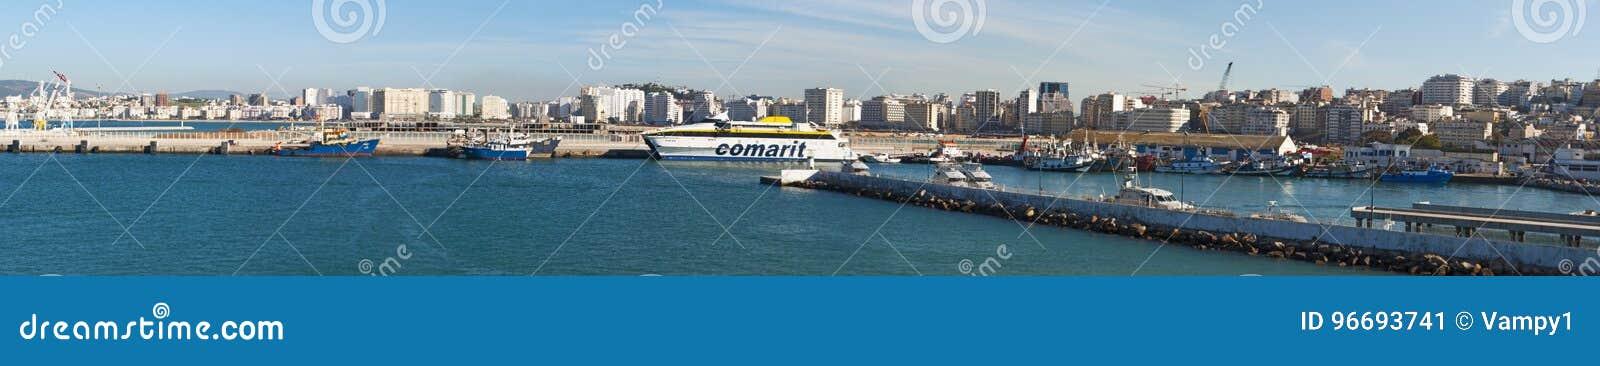 Tânger, Tânger, Tanger, Marrocos, África, Norte de África, costa de Maghreb, estreito de Gibraltar, mar Mediterrâneo, Oceano Atlâ